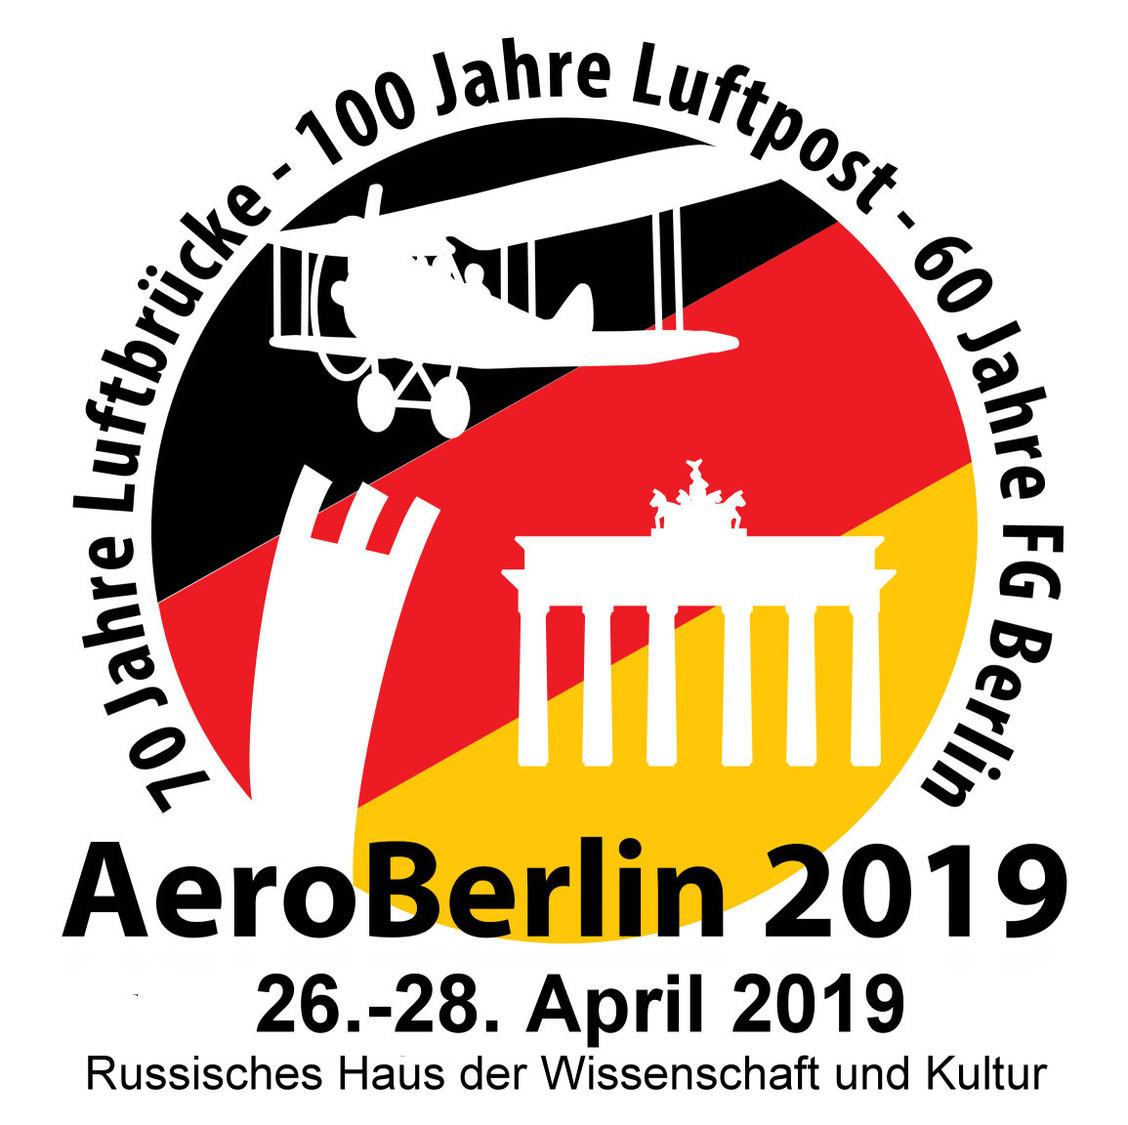 AeroBerlin 2019